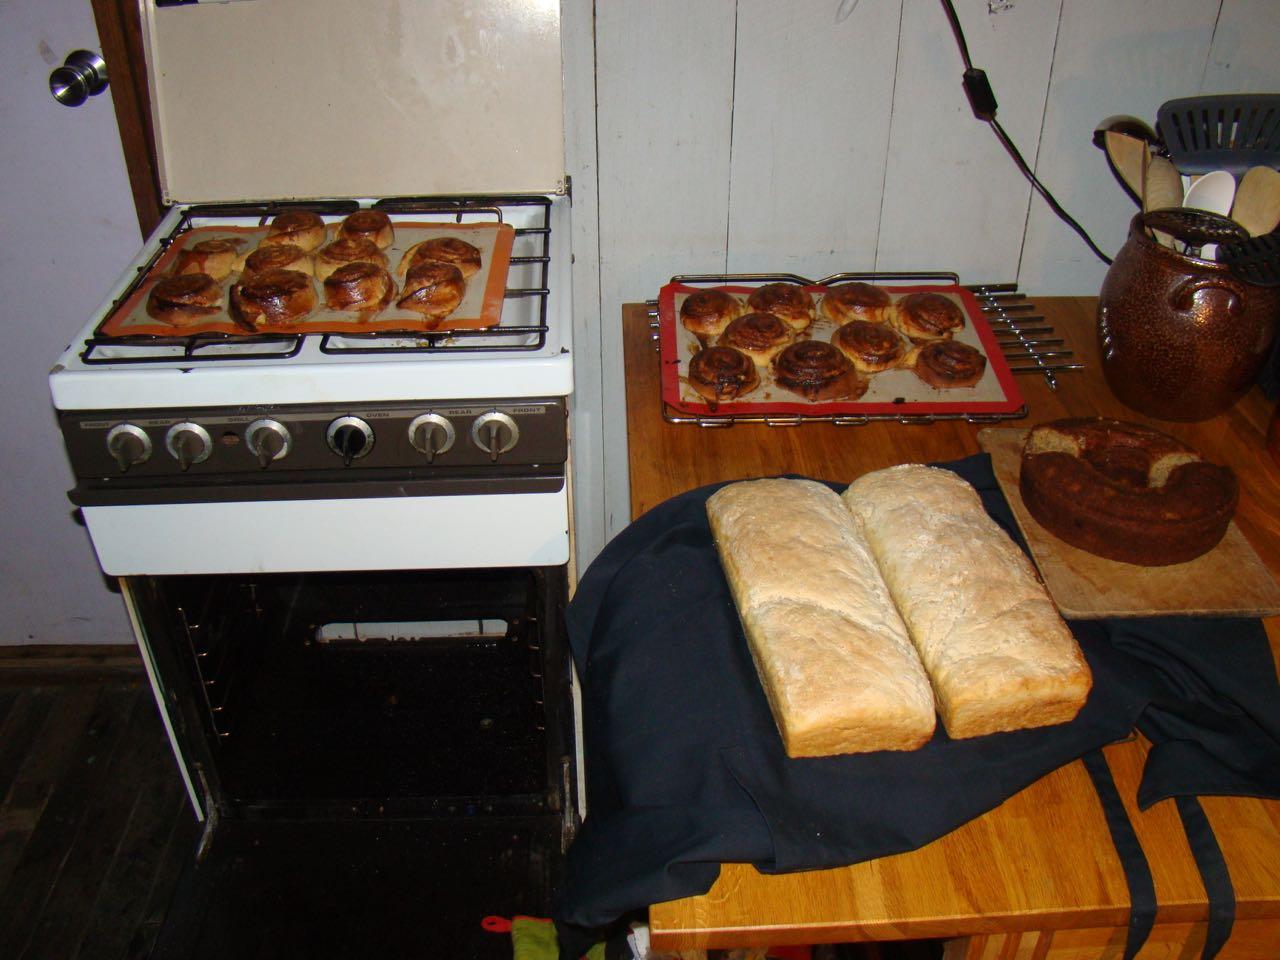 Cinnamon buns, bread and Lynnewood banana cake